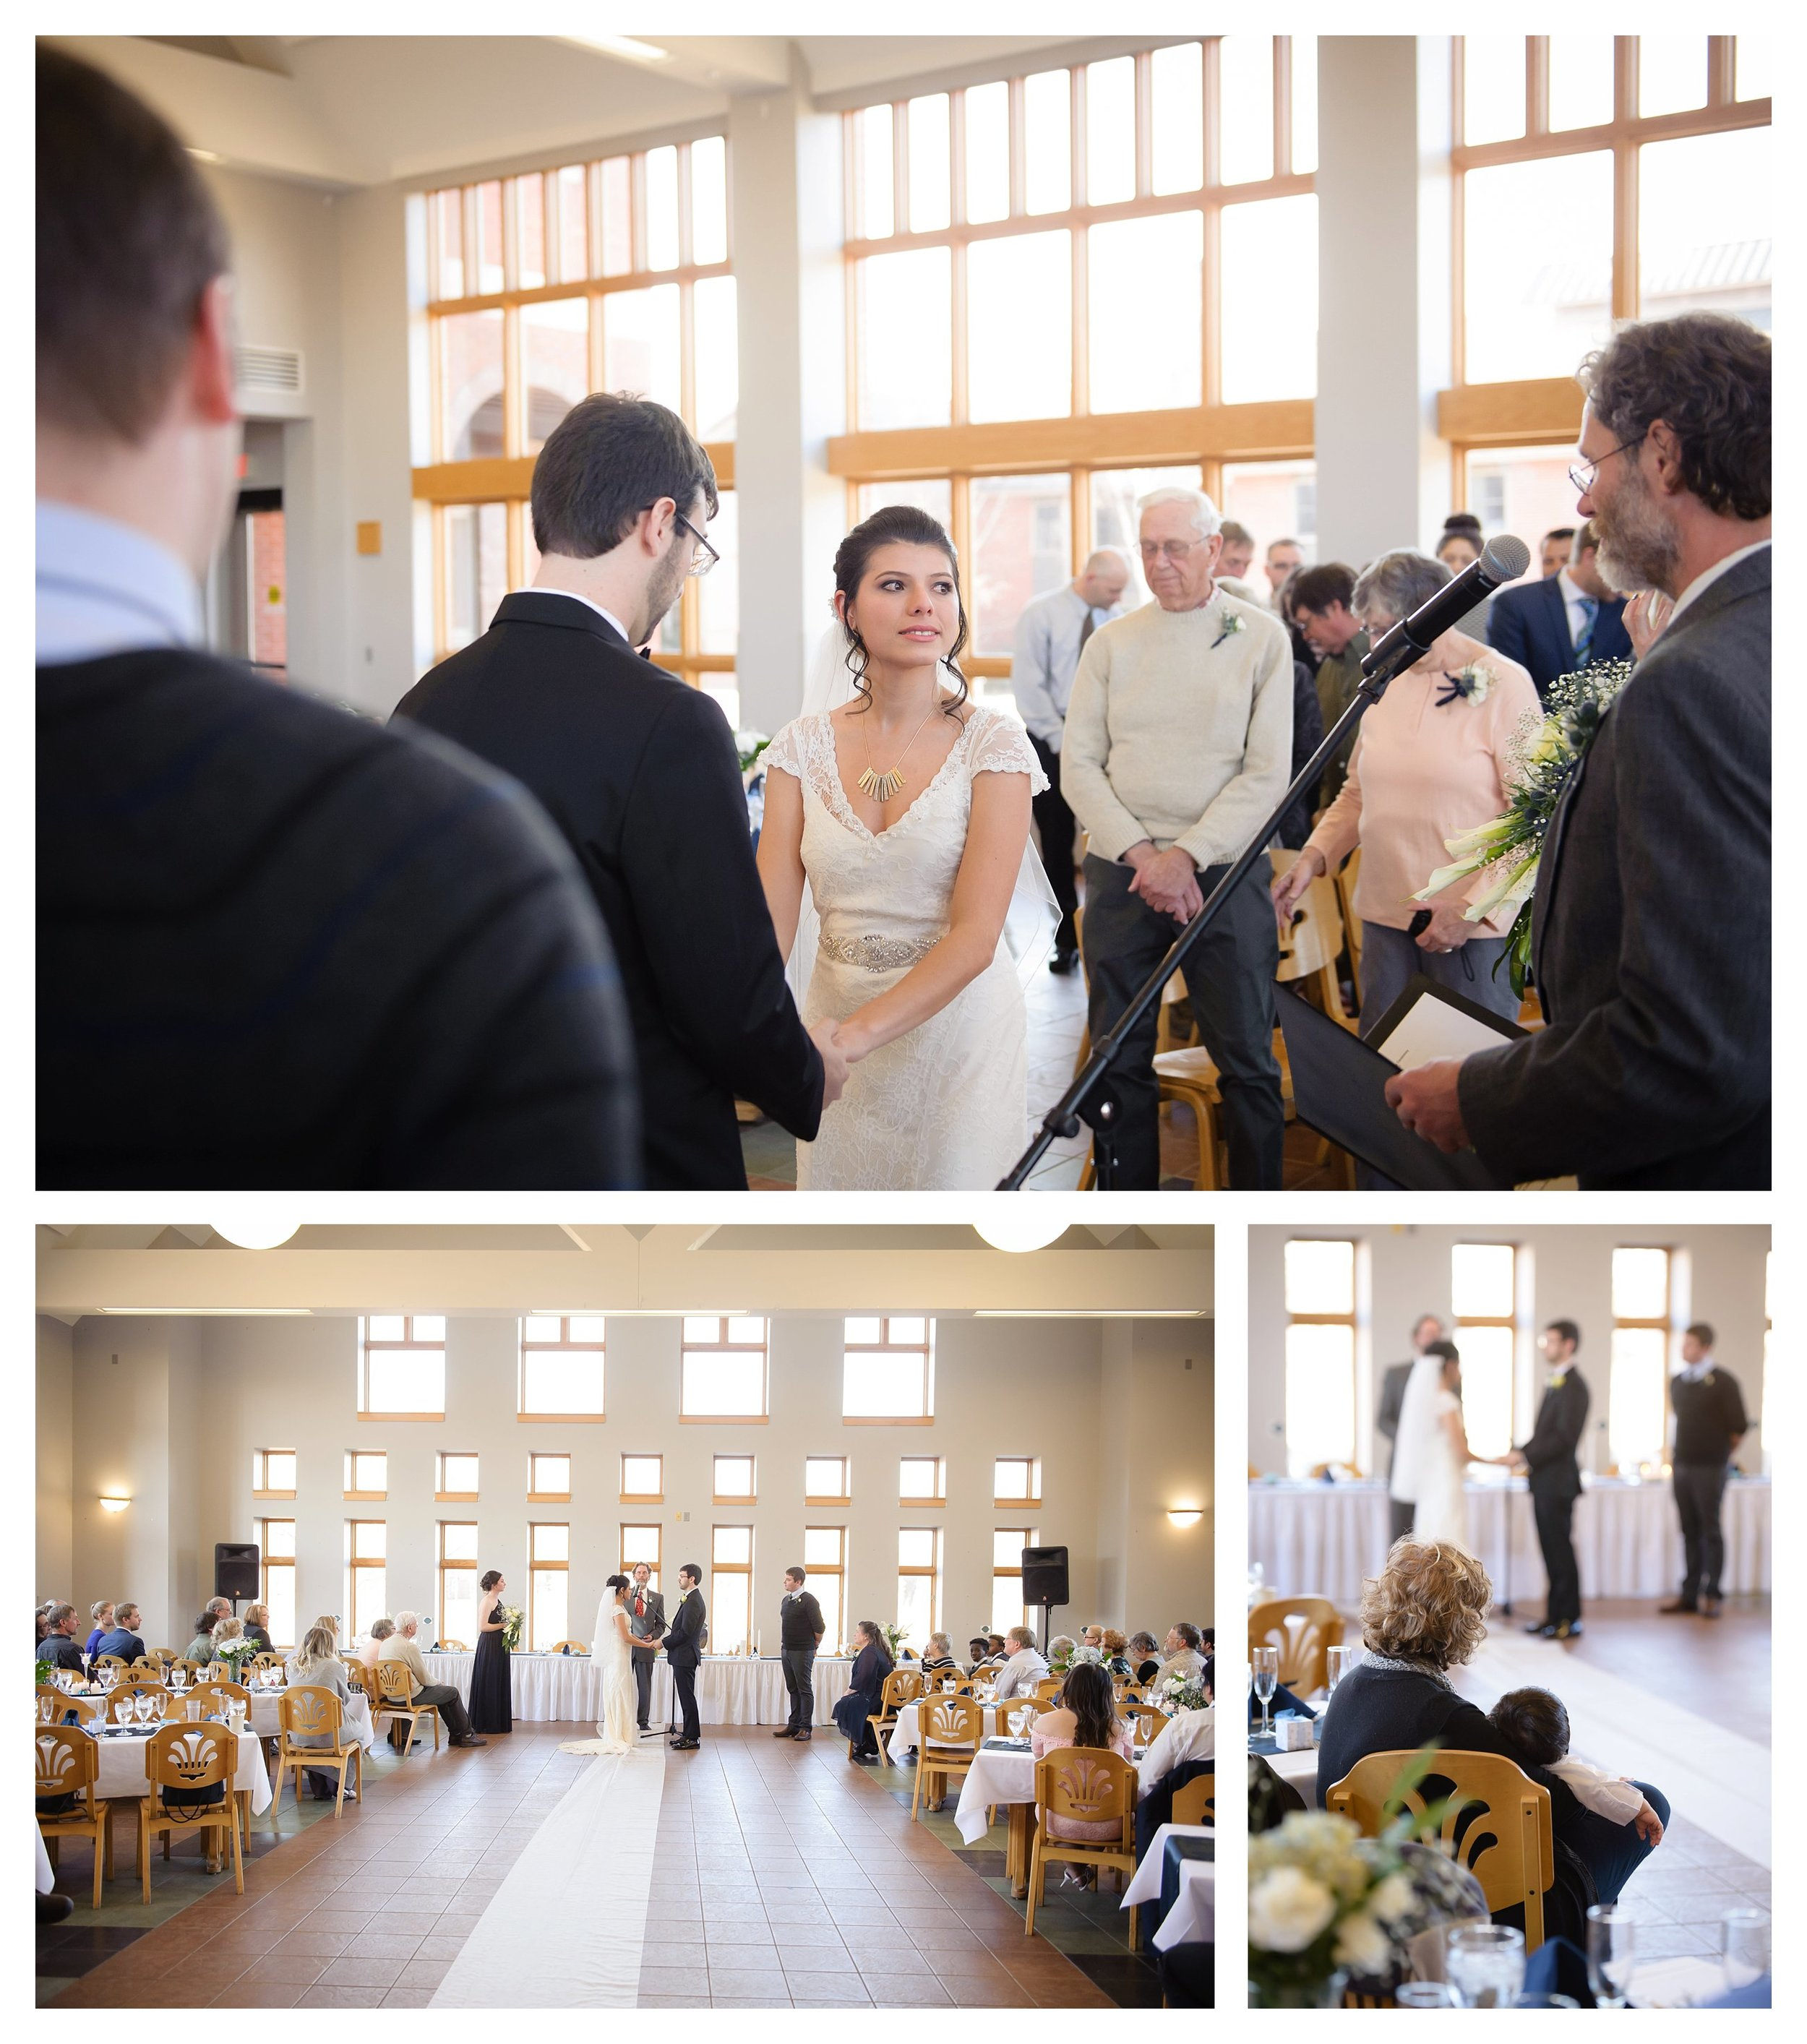 ashland wedding photographer iron river brule wisconsin ps 139 photography jen jensen_0131.jpg